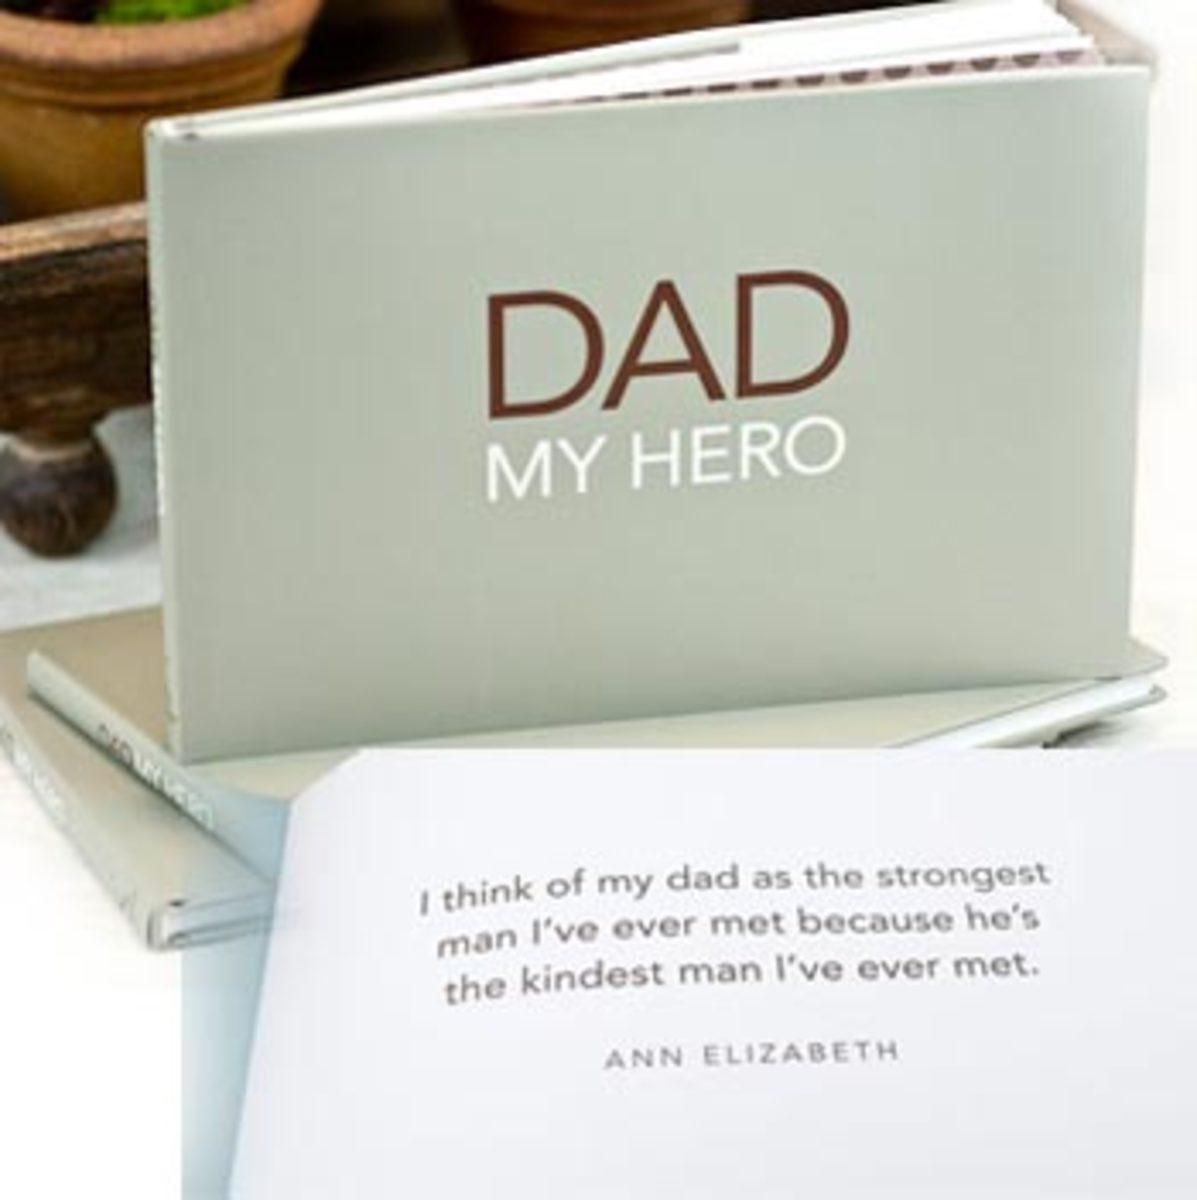 My Inspiration My Dad